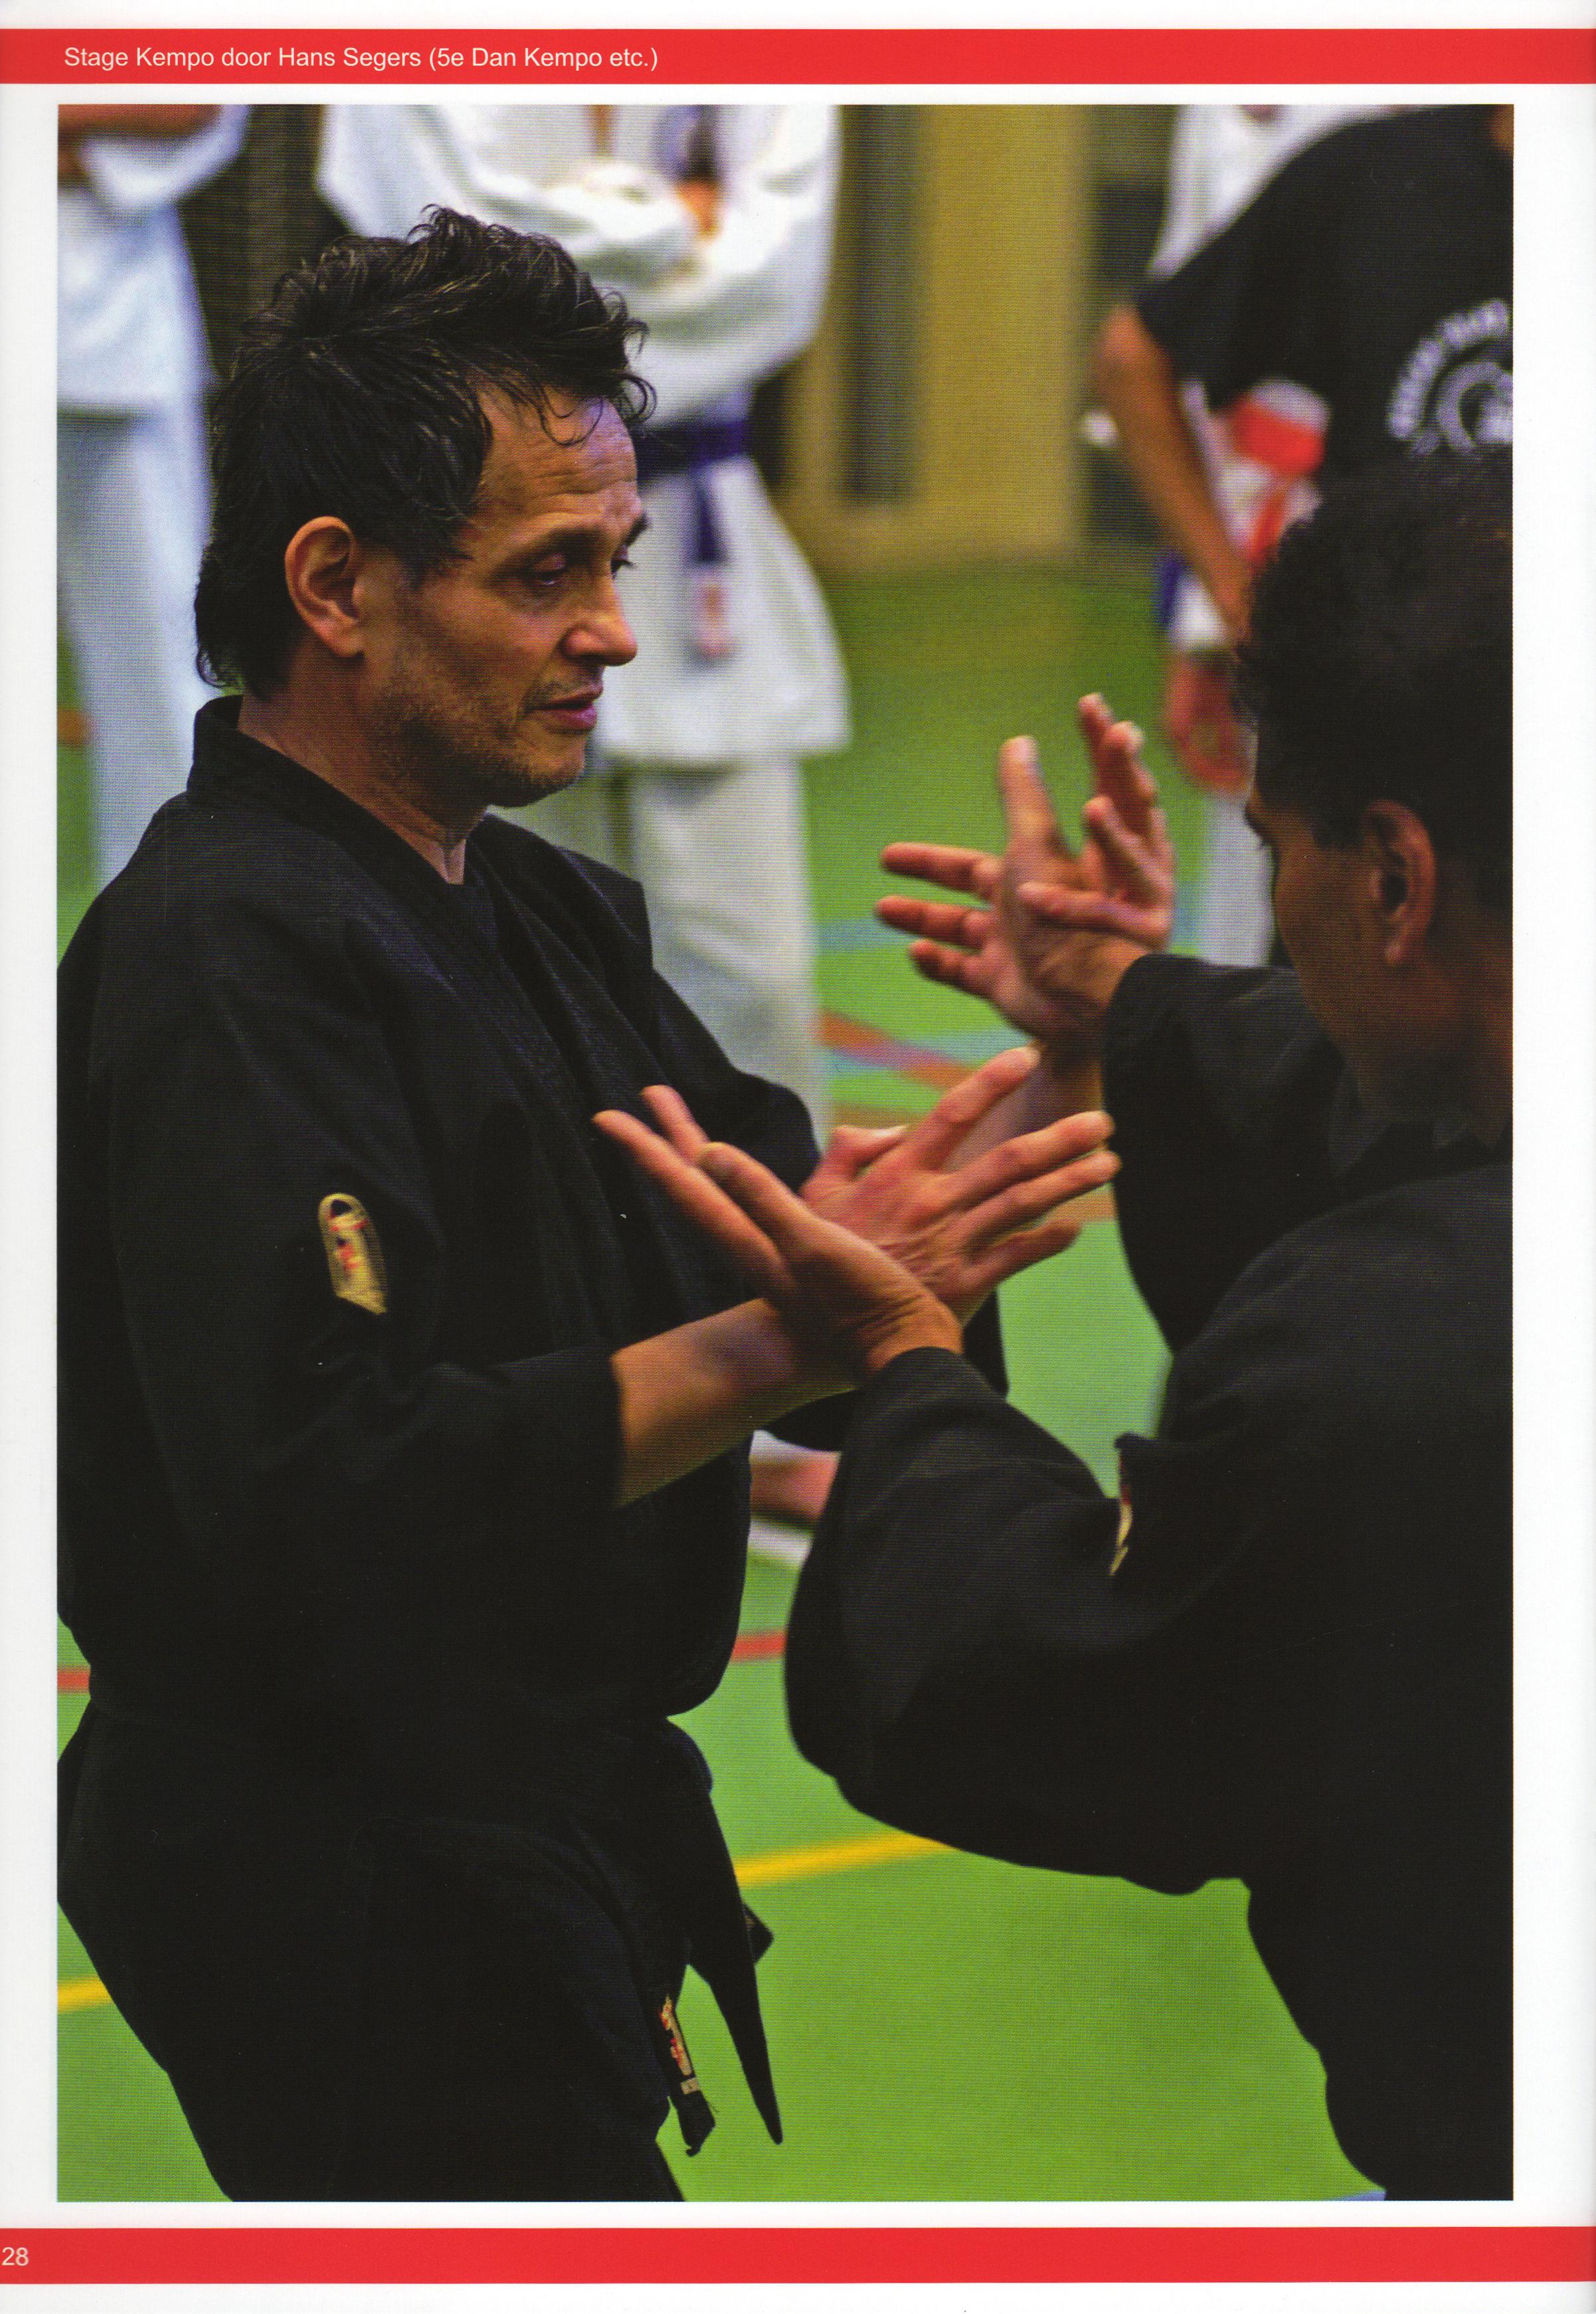 2012-11-04 NFK 7 Masters Martial Arts Festival Fotomagazine 2012 Pagina 28.jpg